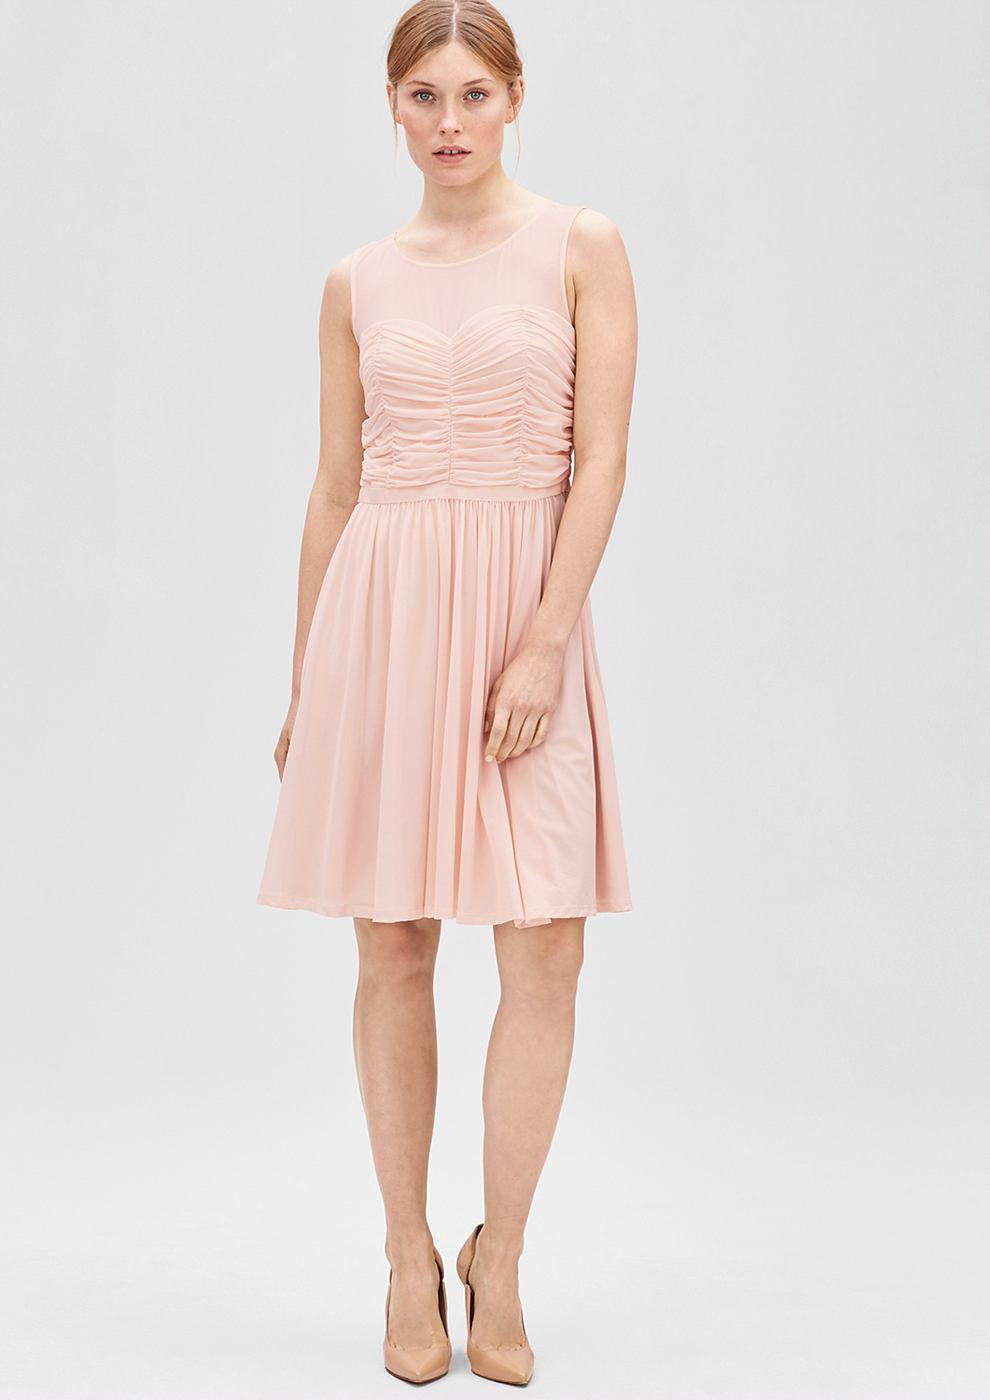 s.Oliver Premium Mesh jurk met rafels roze